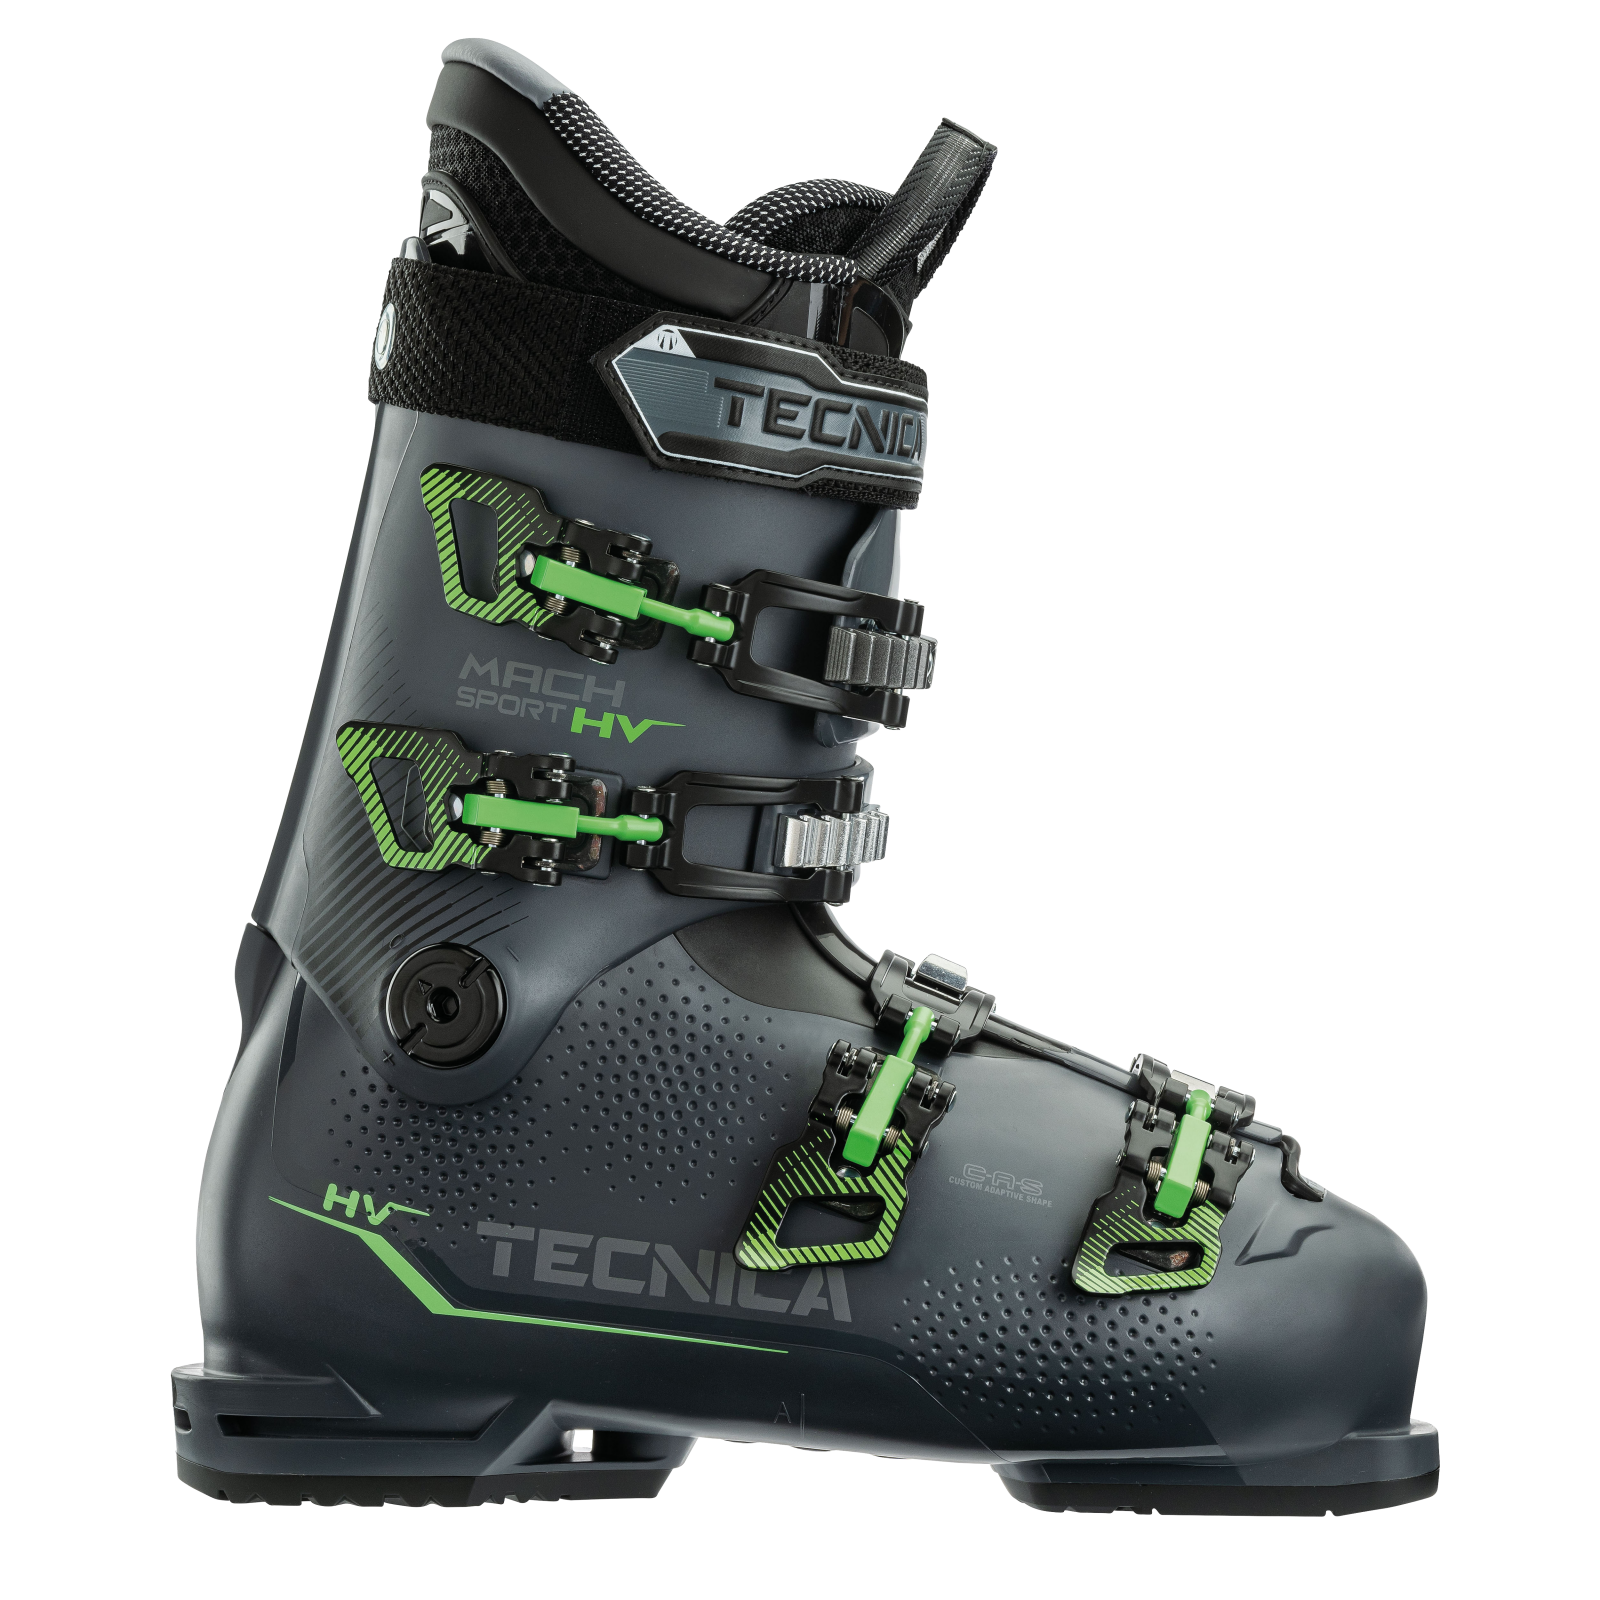 2021 Tecnica Mach Sport HV 90 Men's Ski Boots